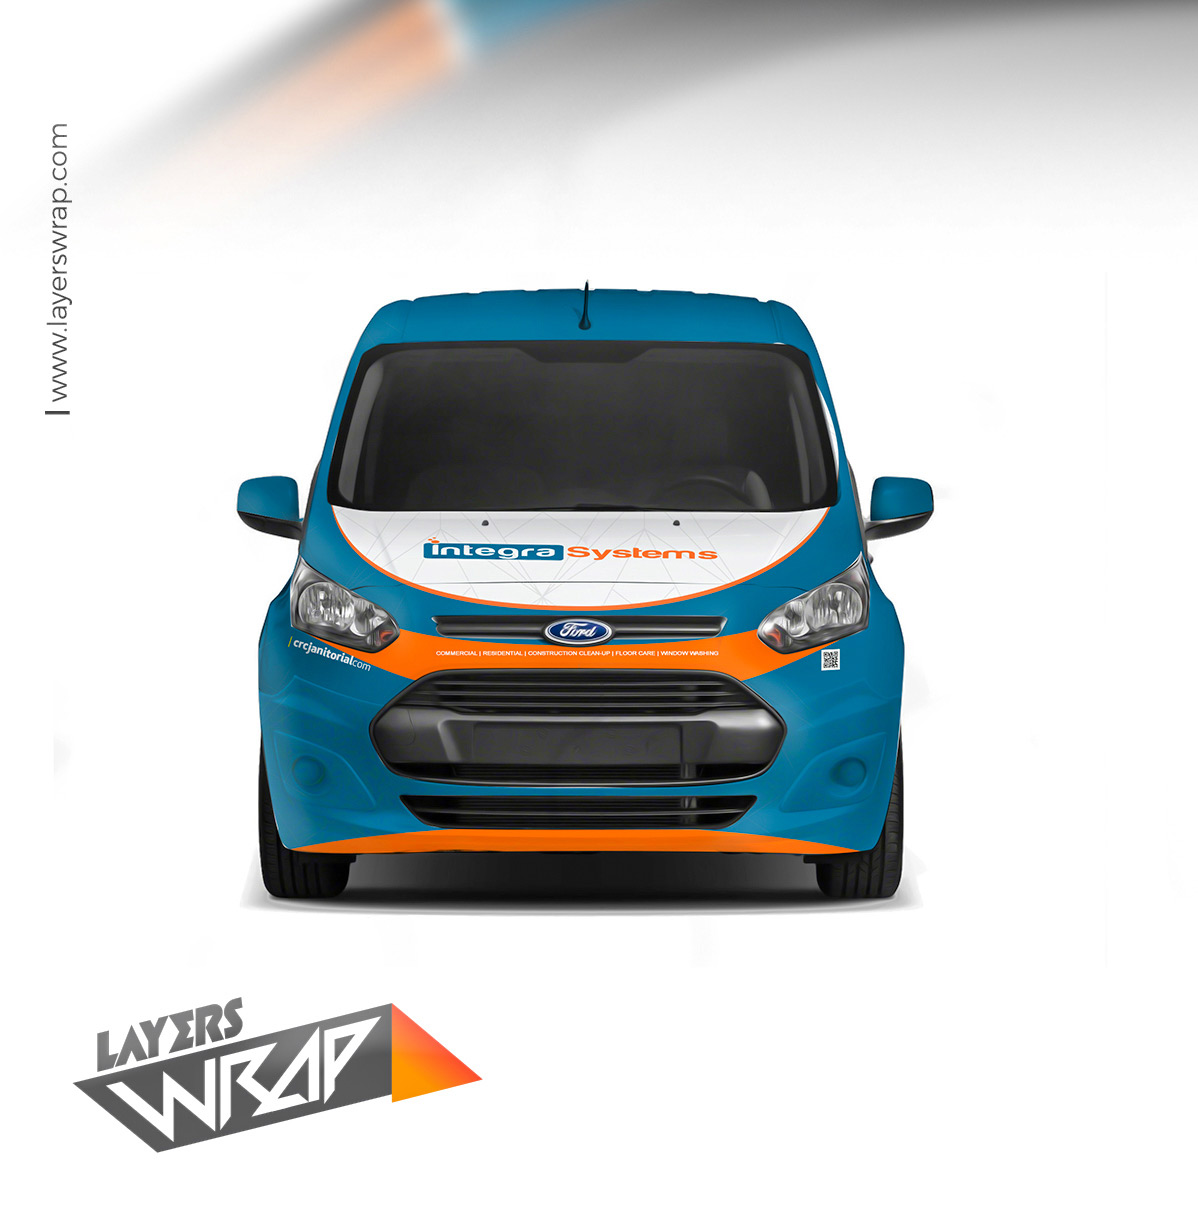 Ford transit connect branding design